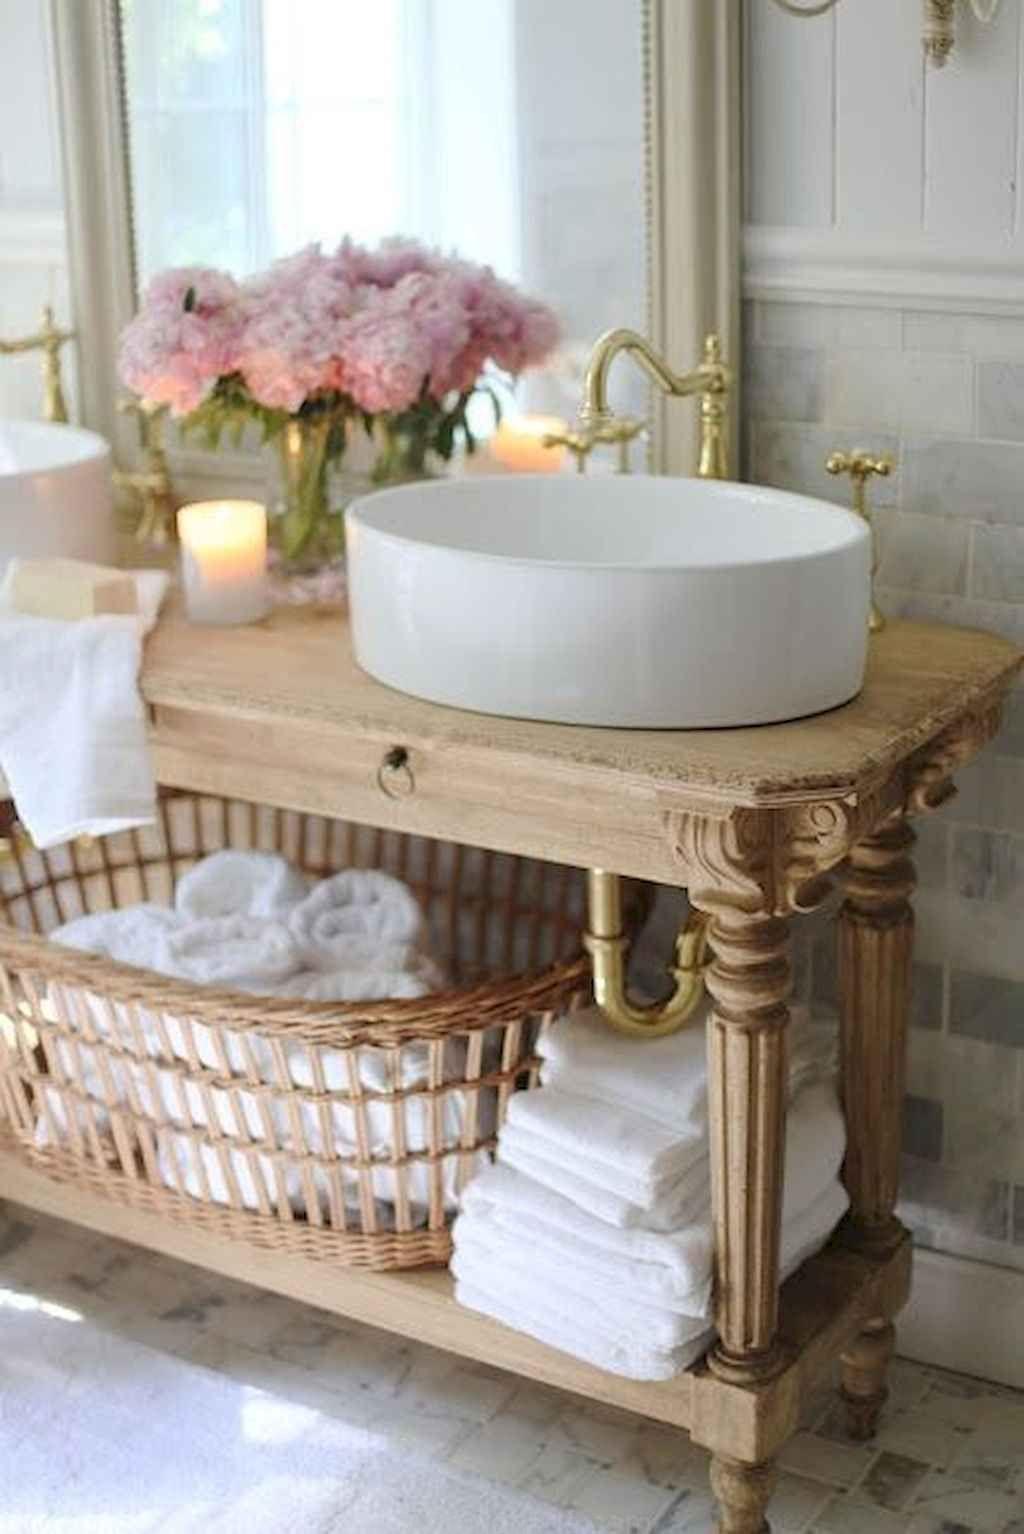 55 Franzosisch Land Stil Badezimmer Design Ideen Country Bathroom Designs French Cottage Bathroom Country Style Bathrooms